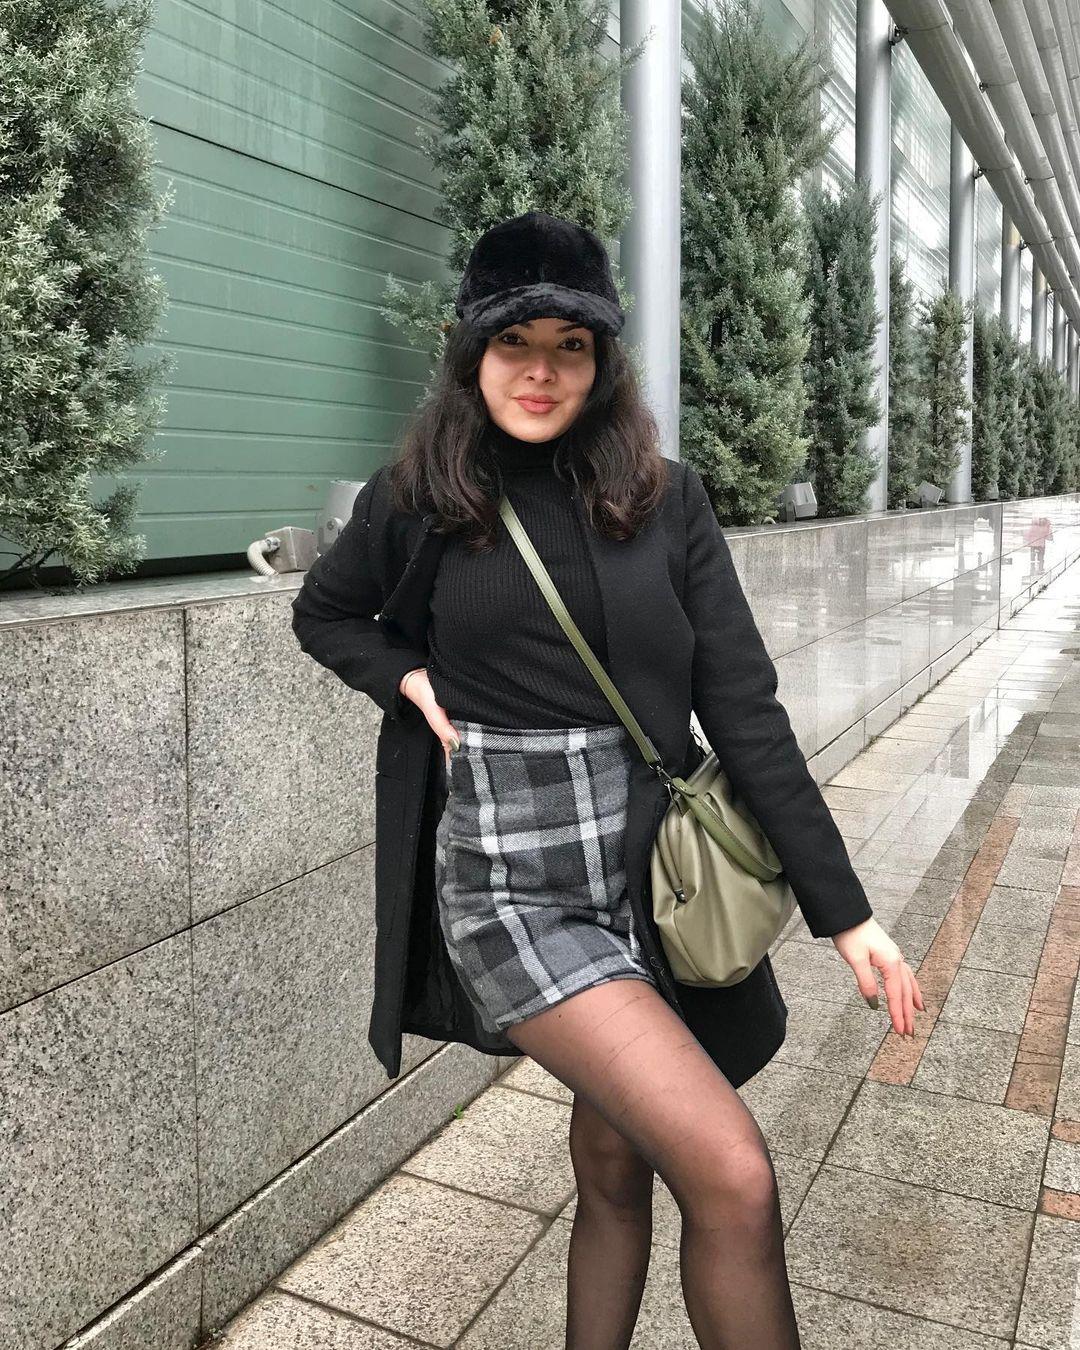 Ileyna-Savuk-Wallpapers-Insta-Fit-Bio-4